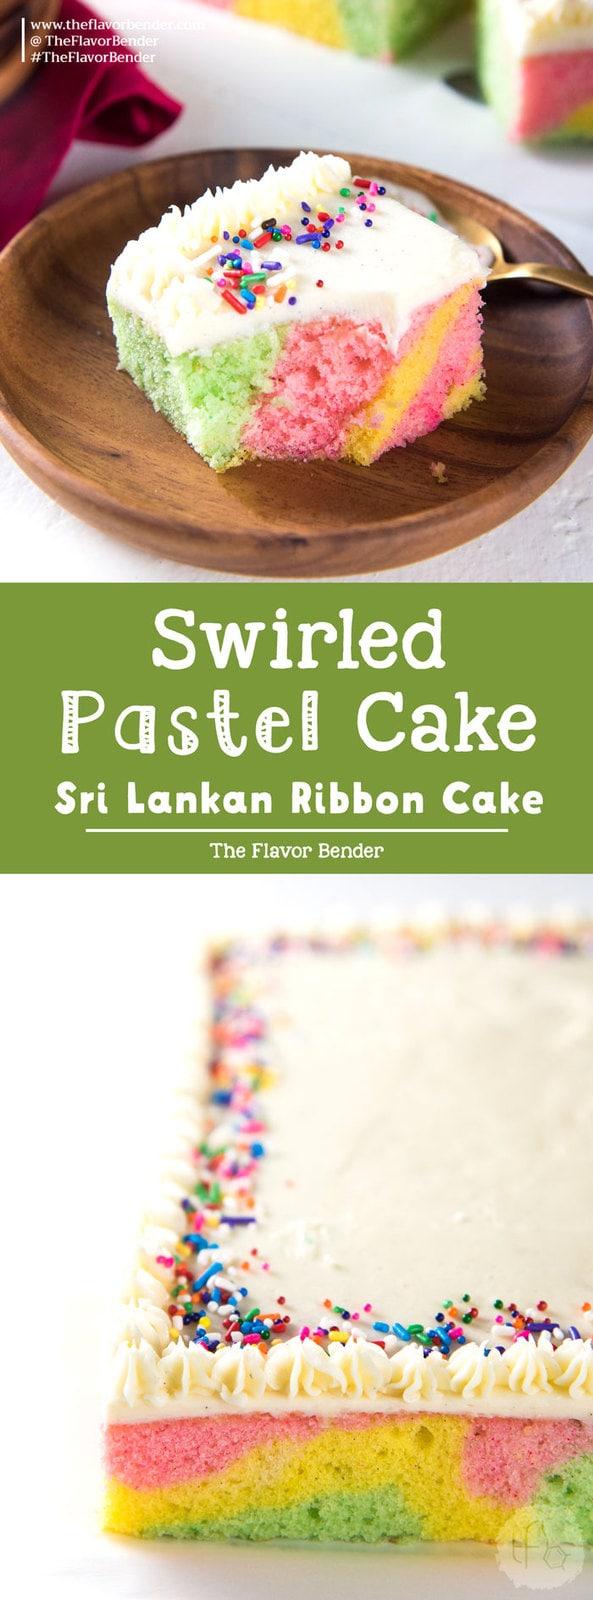 Swirled Pastel Cake (Ribbon Cake) - a delicious vanilla cake with pastel swirls, and vanilla buttercream frosting. Perfect for birthdays, and celebrations like Easter!#SwirledPastelCake #PastelSheetCake #RibbonCake #VanillaCake